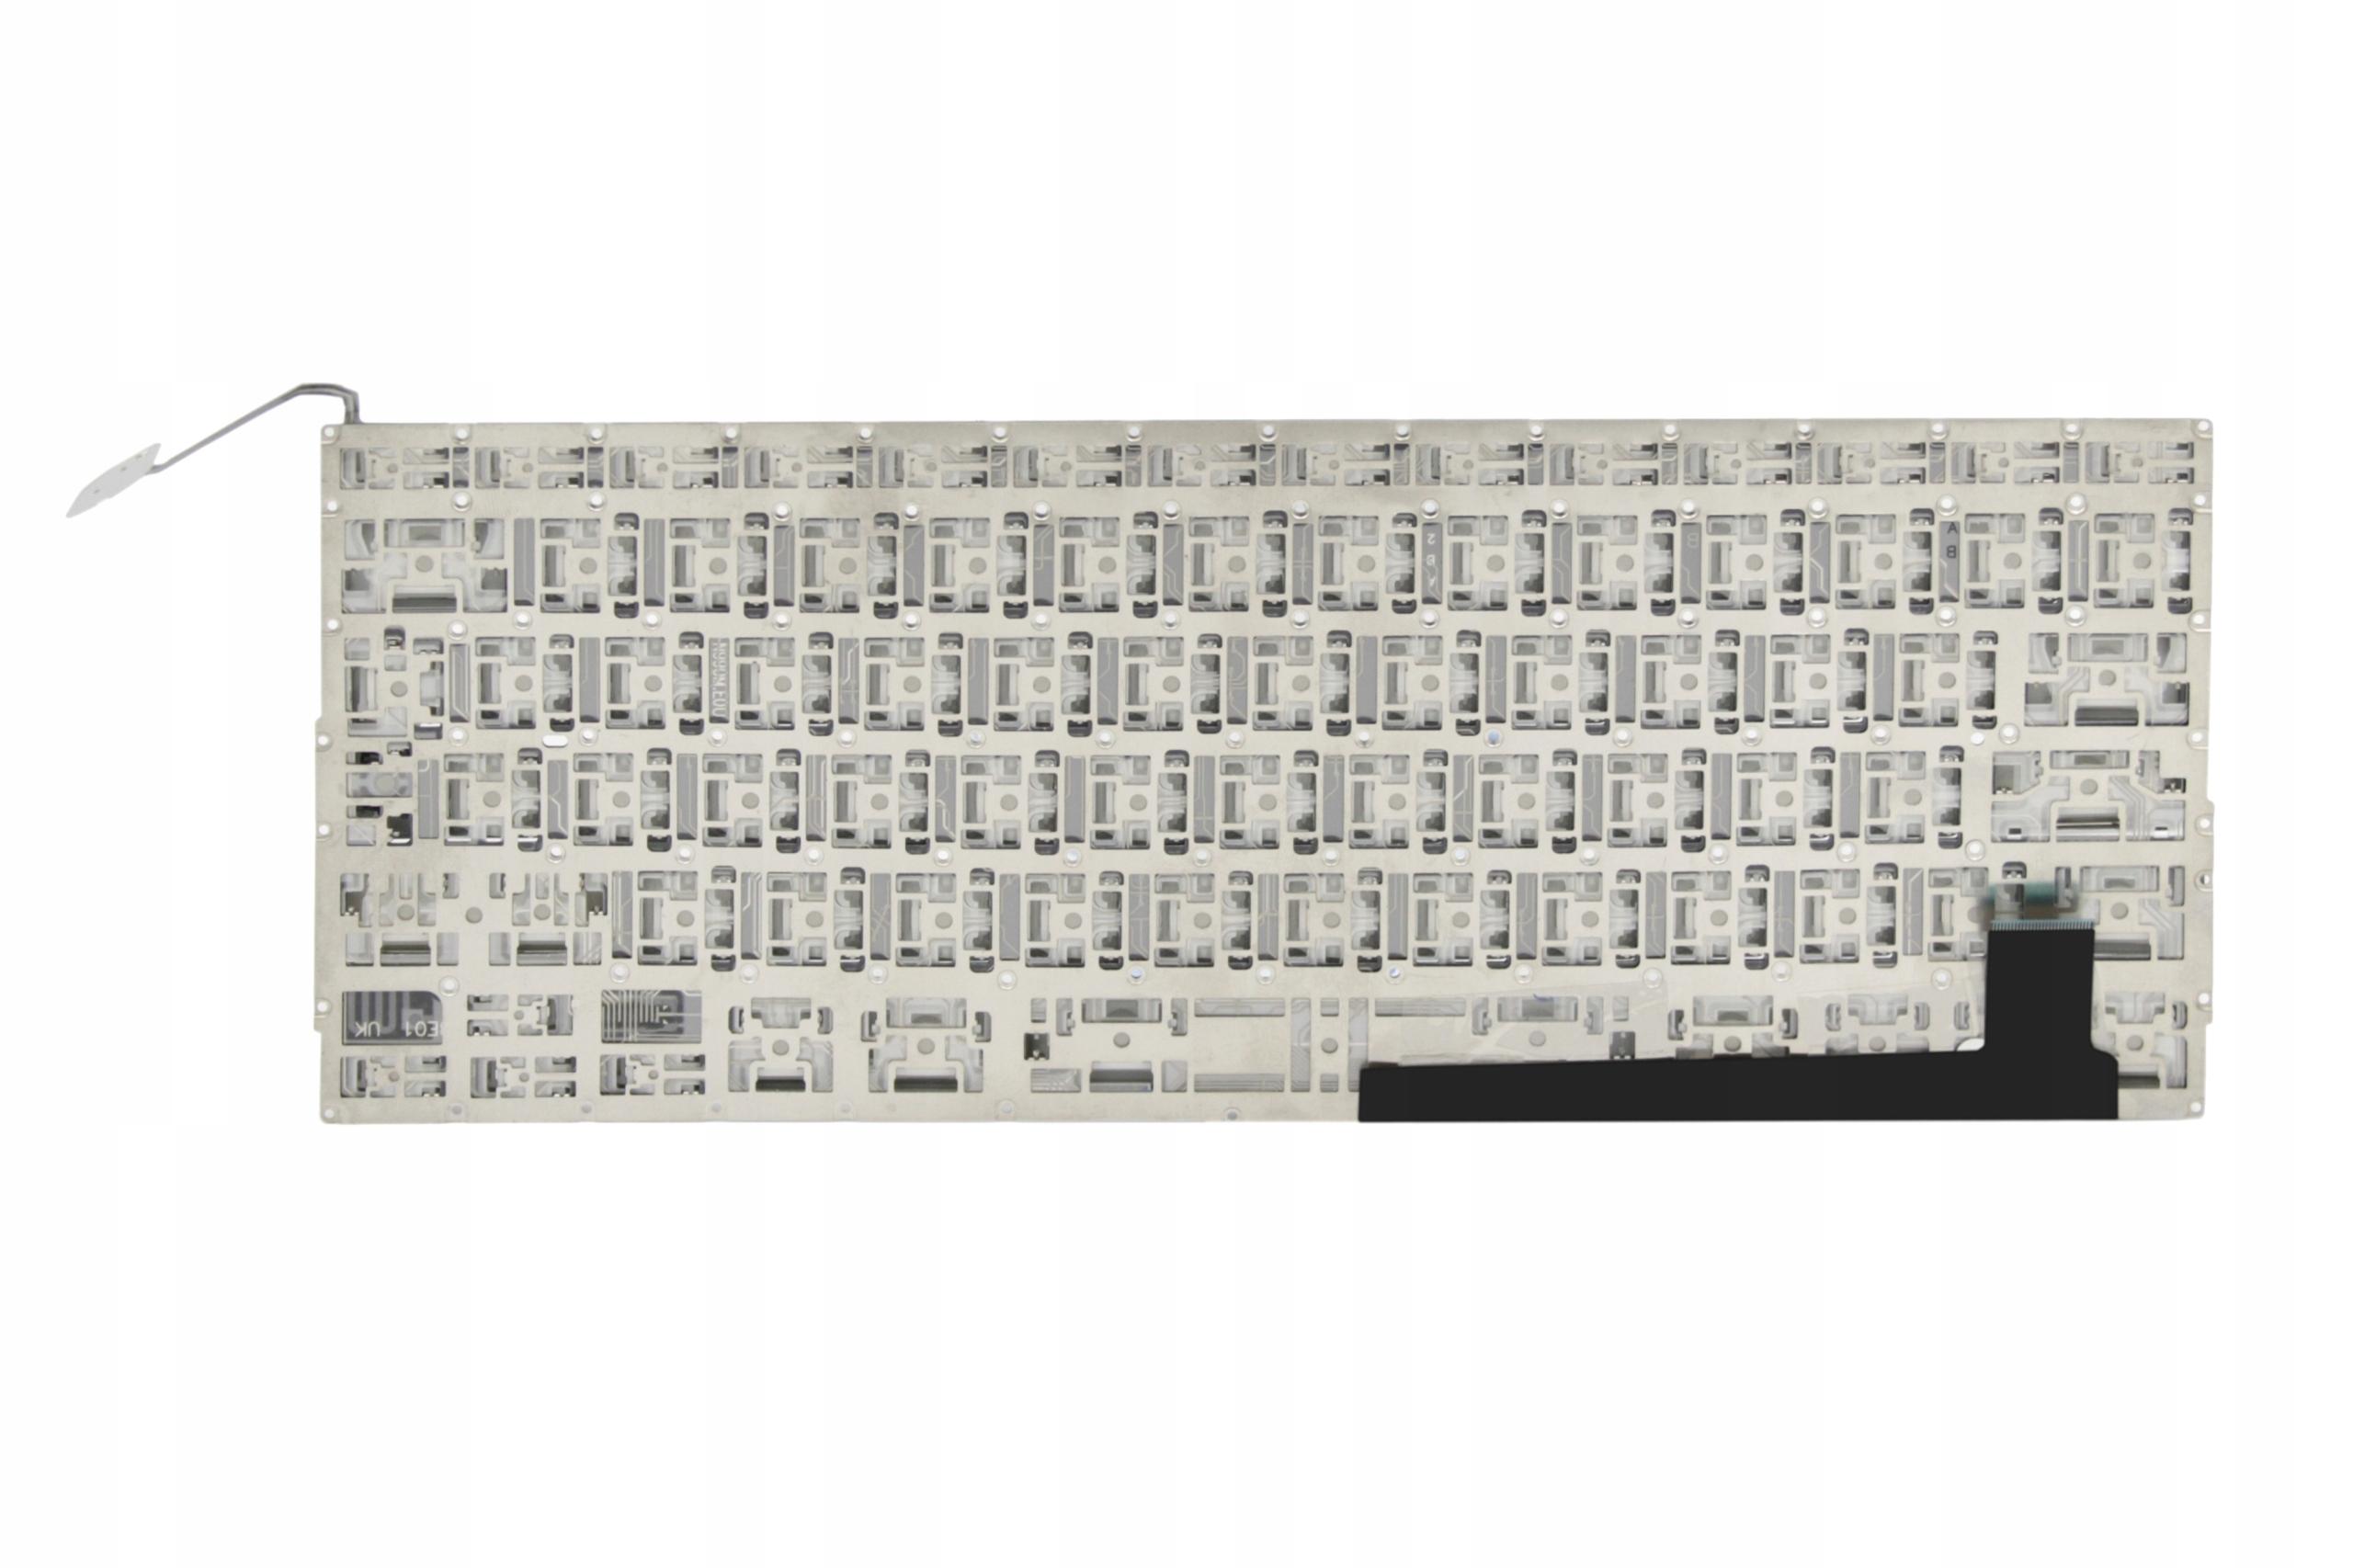 KLAWIATURA APPLE UI MACBOOK A1286 PRO 15 - Klawiatury do laptopów